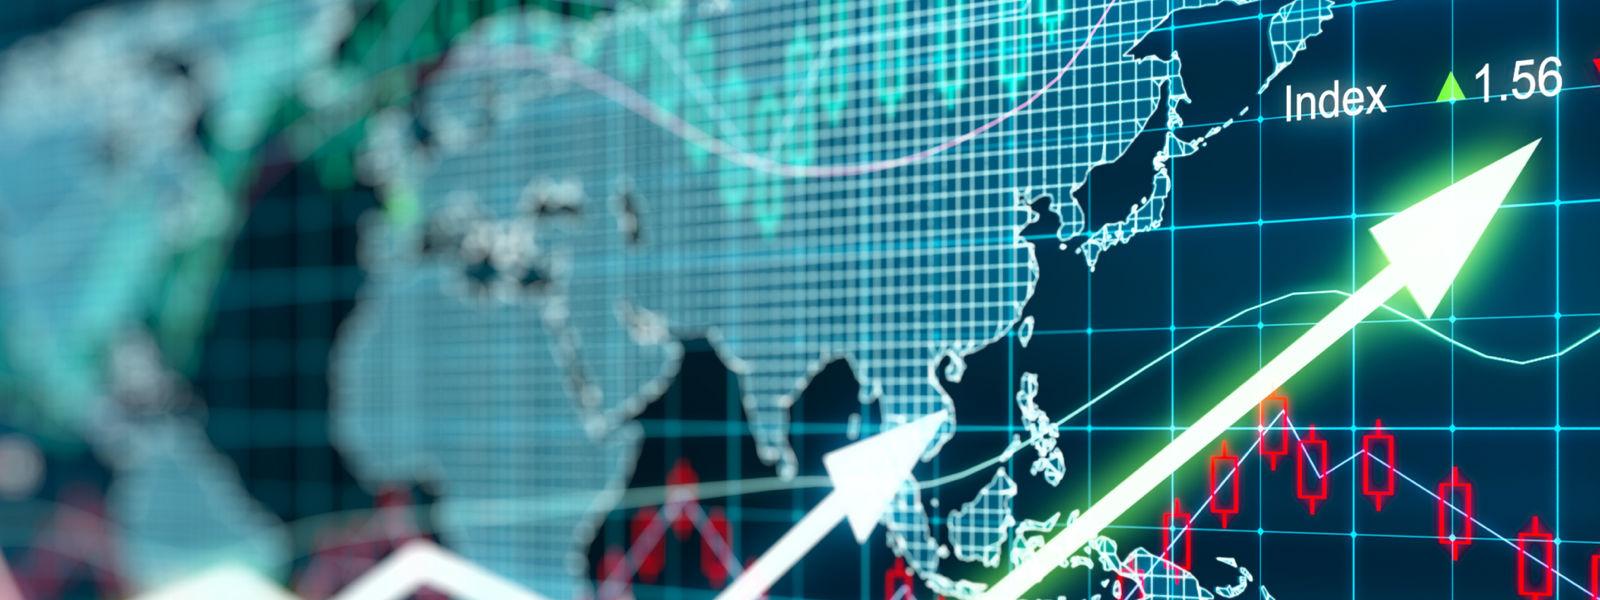 financial-stock-ticker-banner_4.jpg